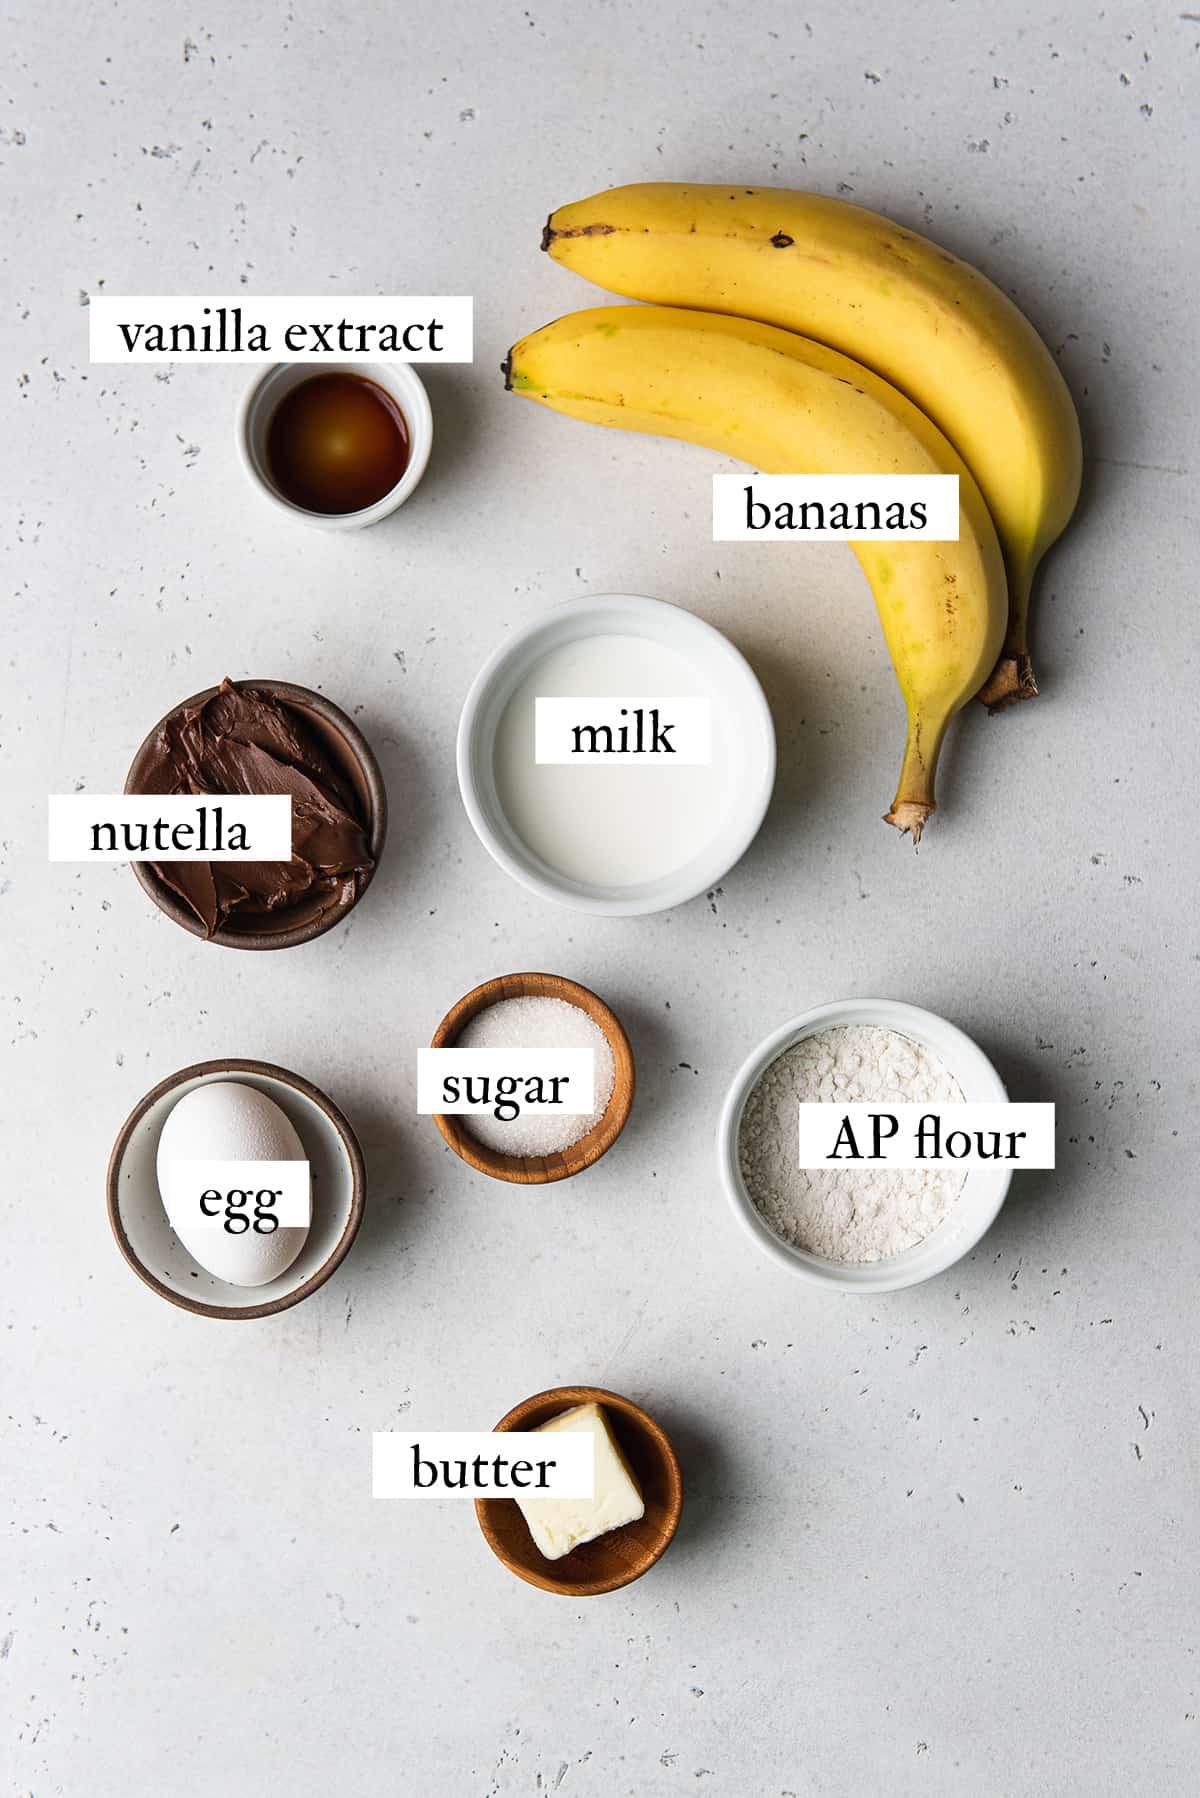 ingredients for German pancakes on white surface